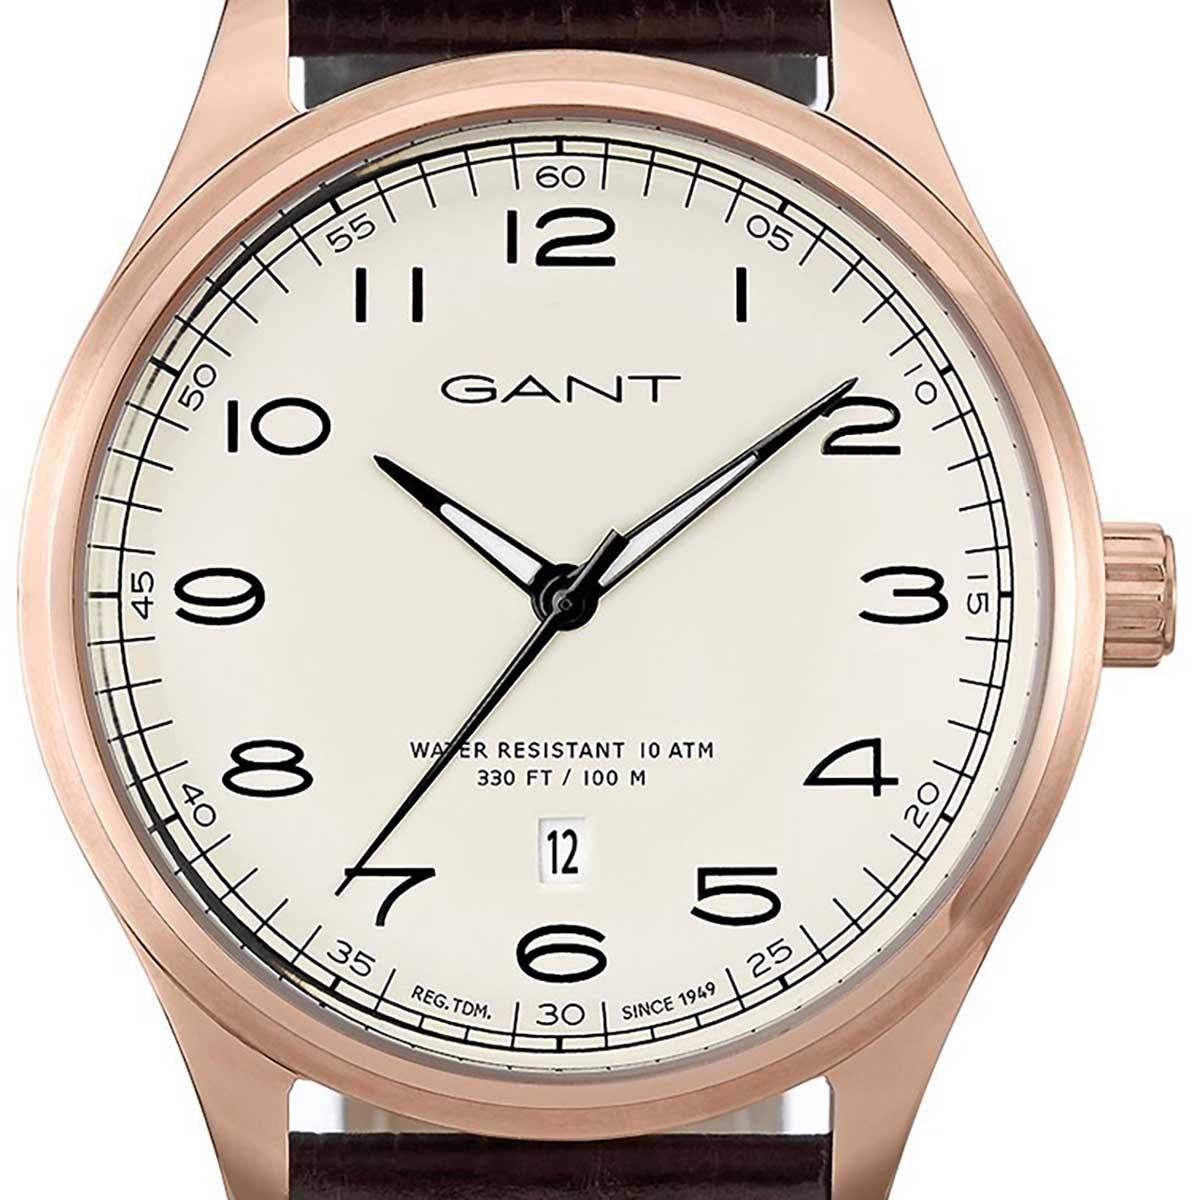 GANT ガント 電池式クォーツ 腕時計 [W71303] 並行輸入品  デイト